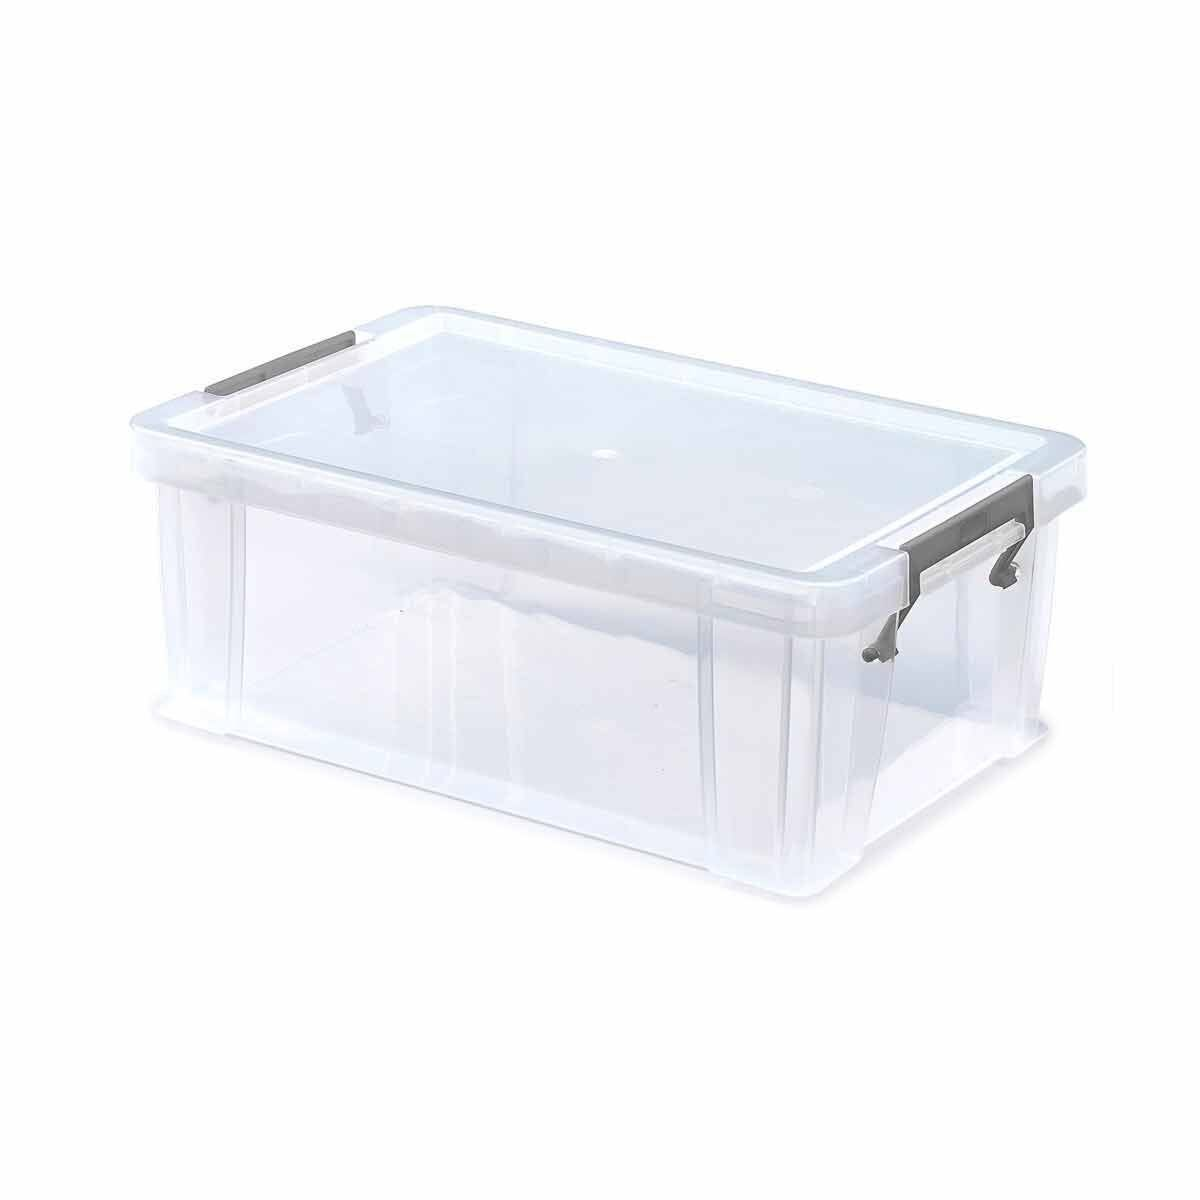 Whitefurze Allstore Plastic Storage Box 10 Litre Pack of 9